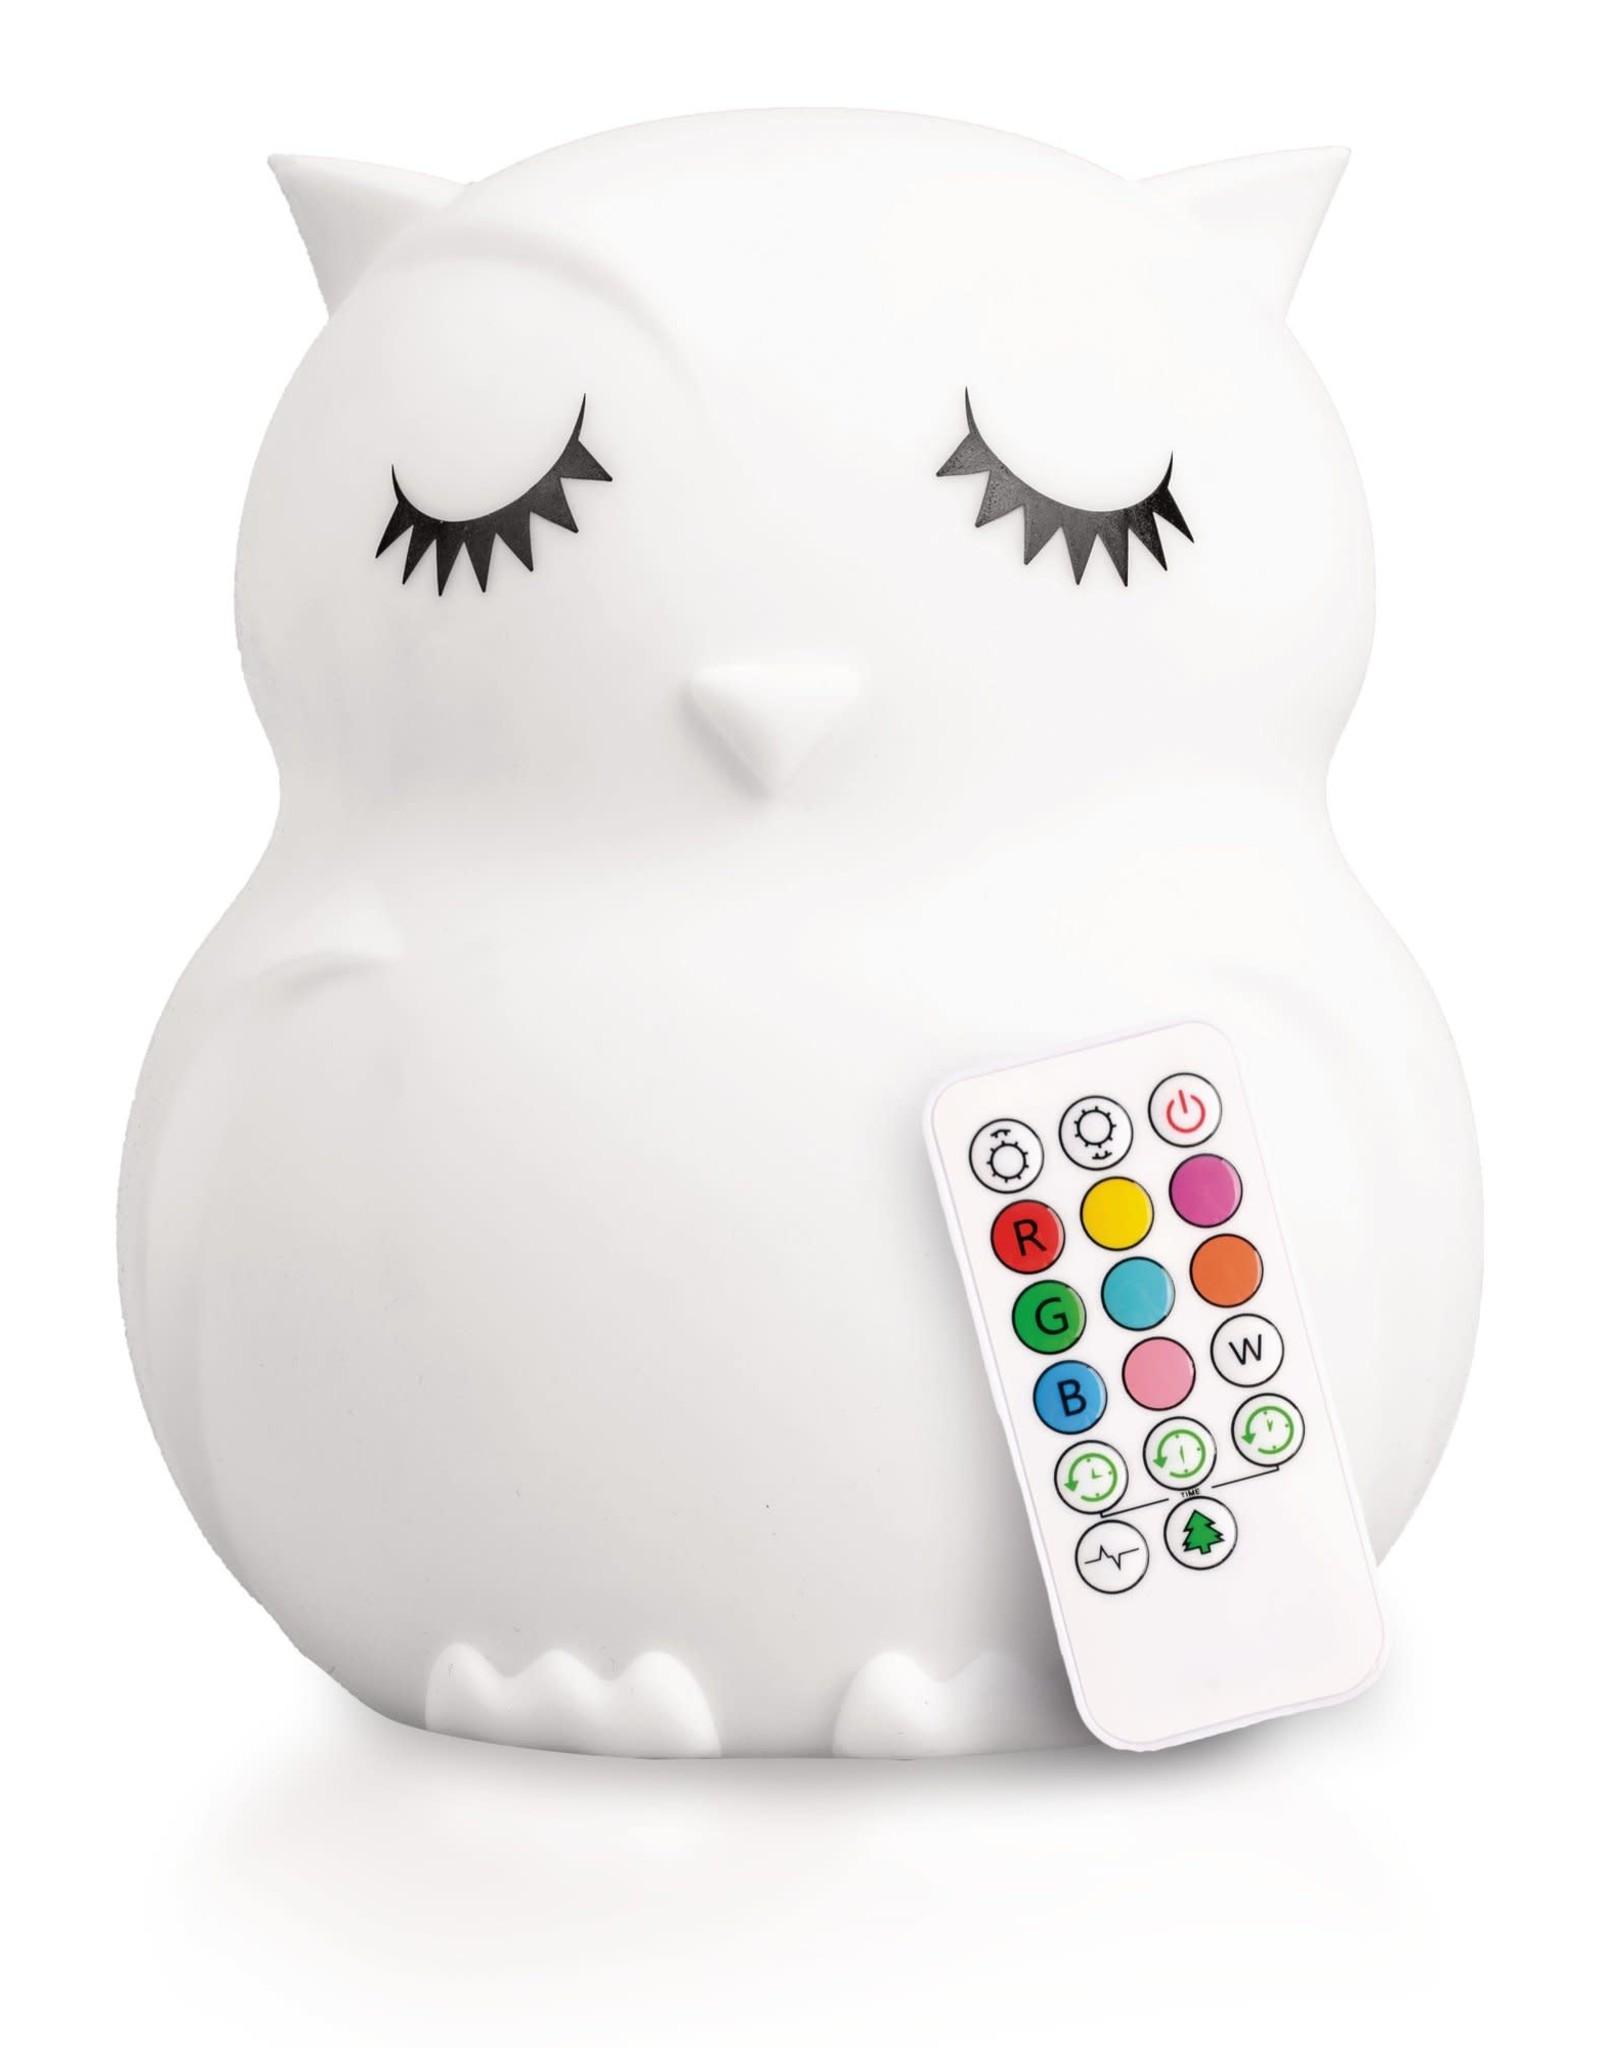 Lumieworld LumiPet Owl Night Light